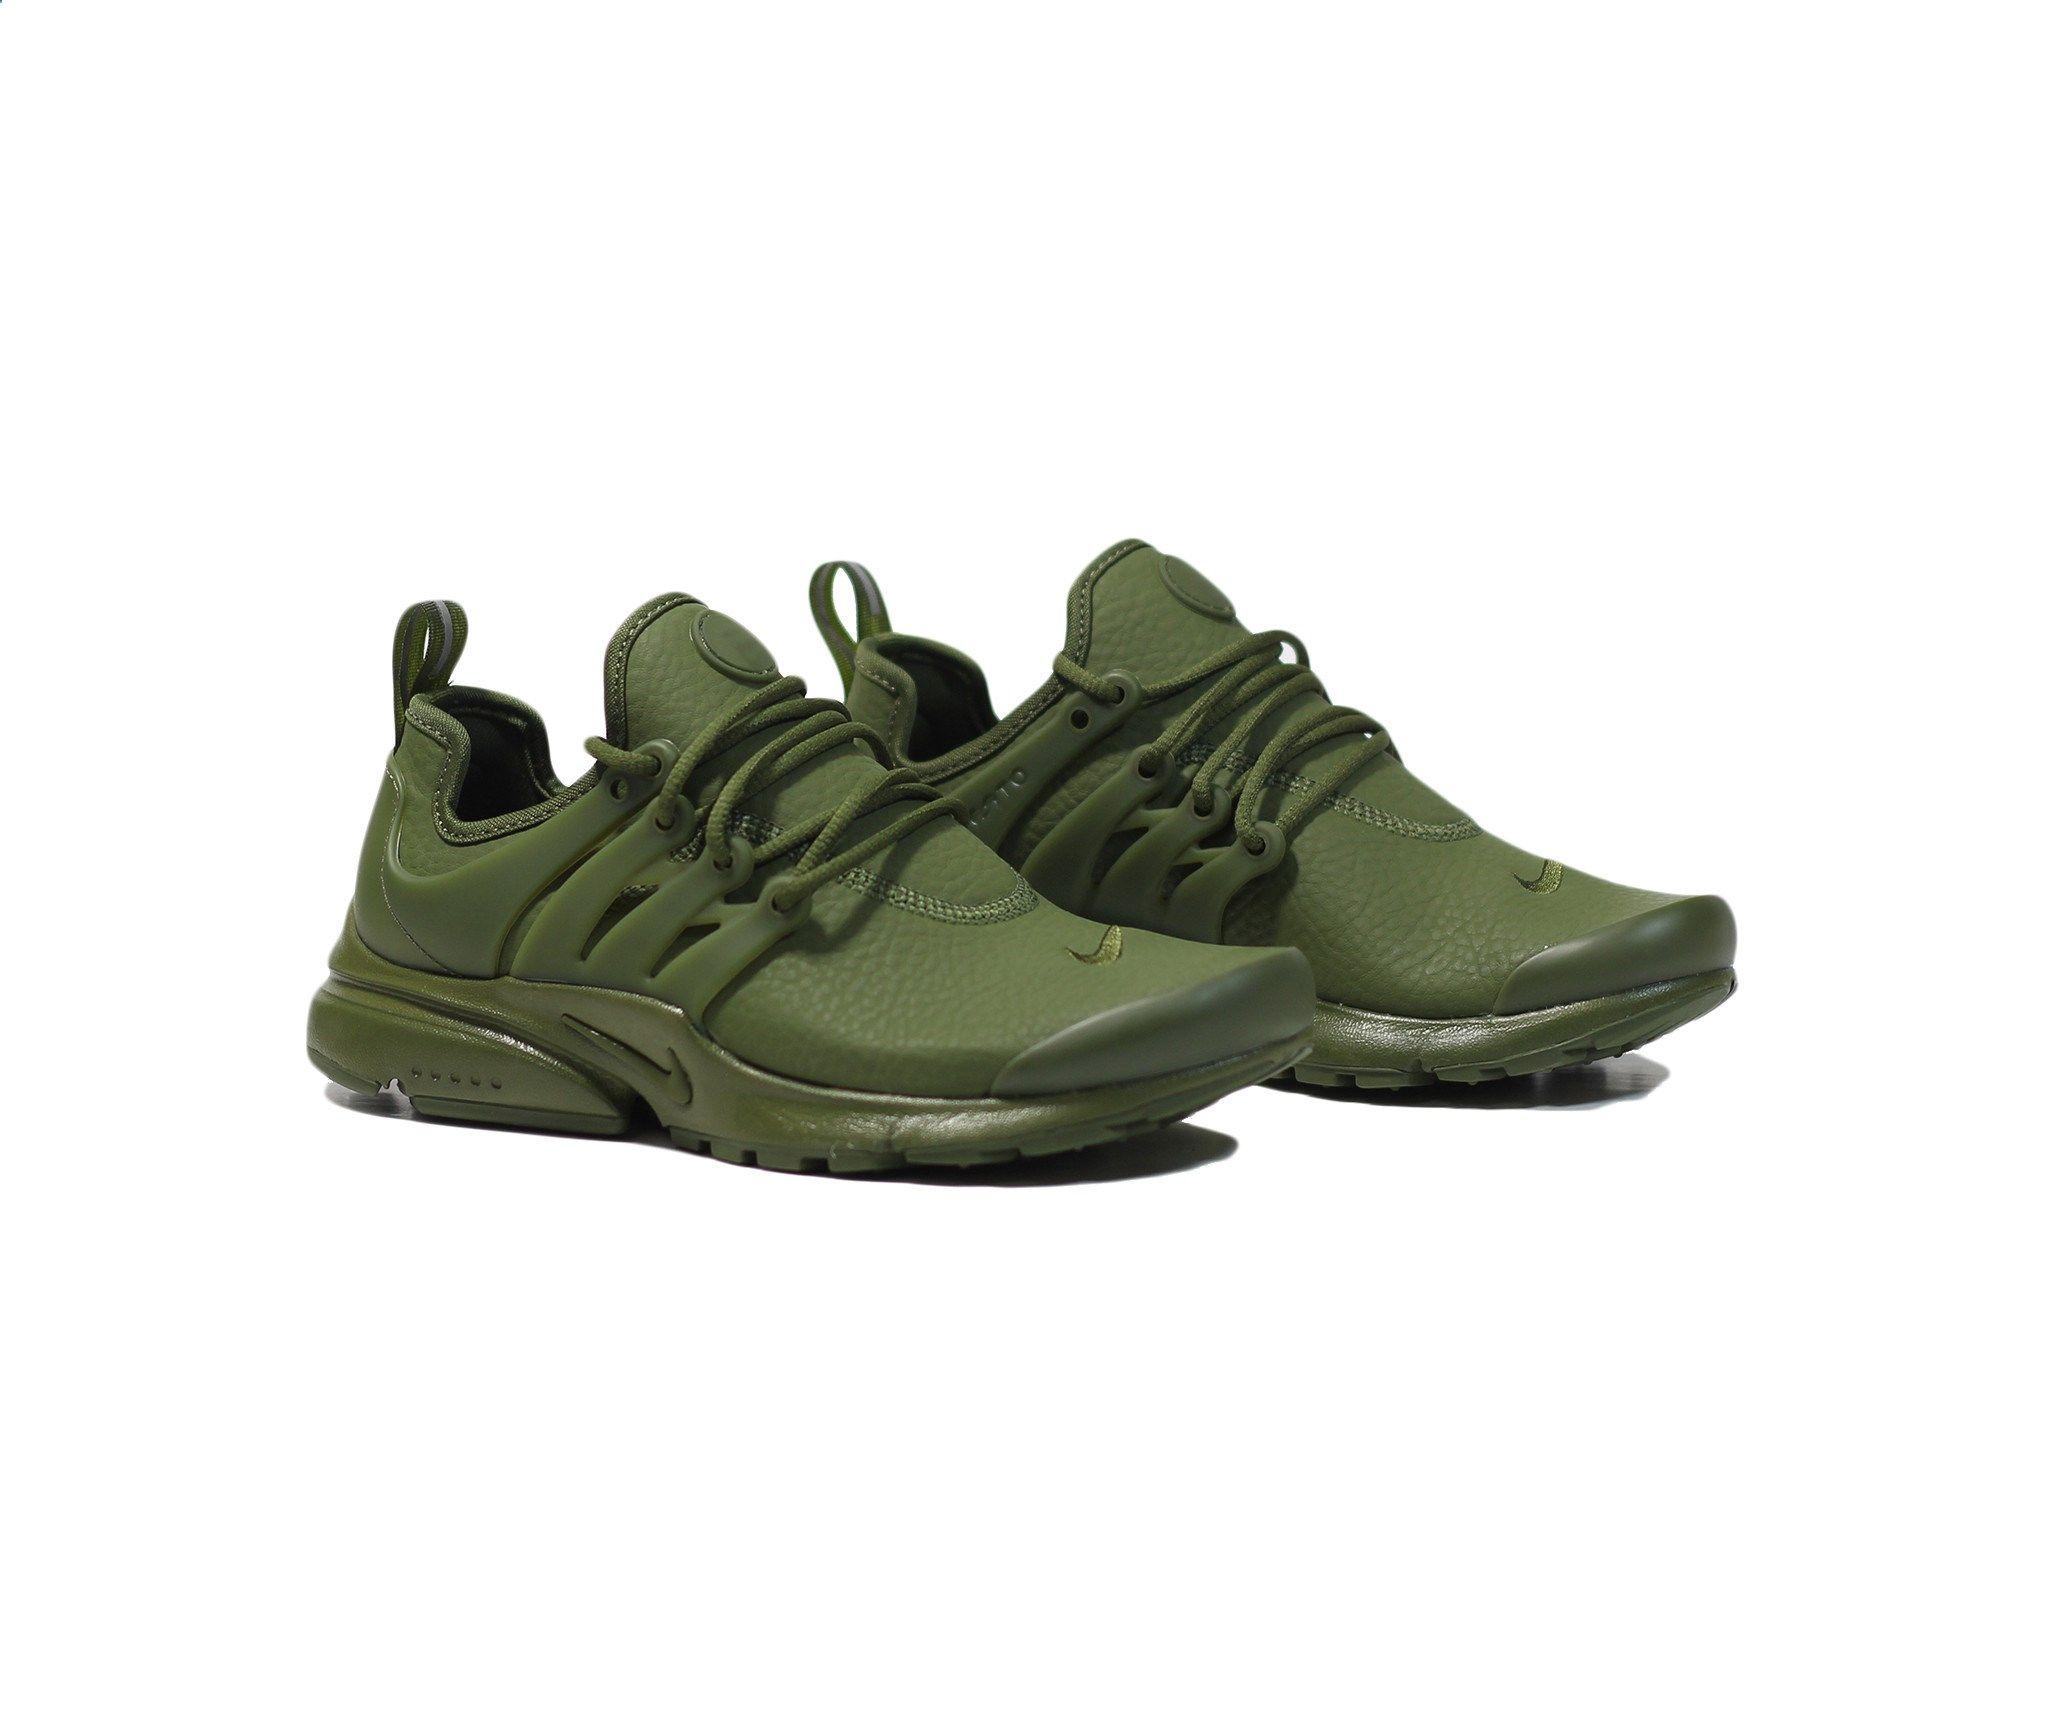 Nike Womens Air Presto PRM - Legion Green/Black